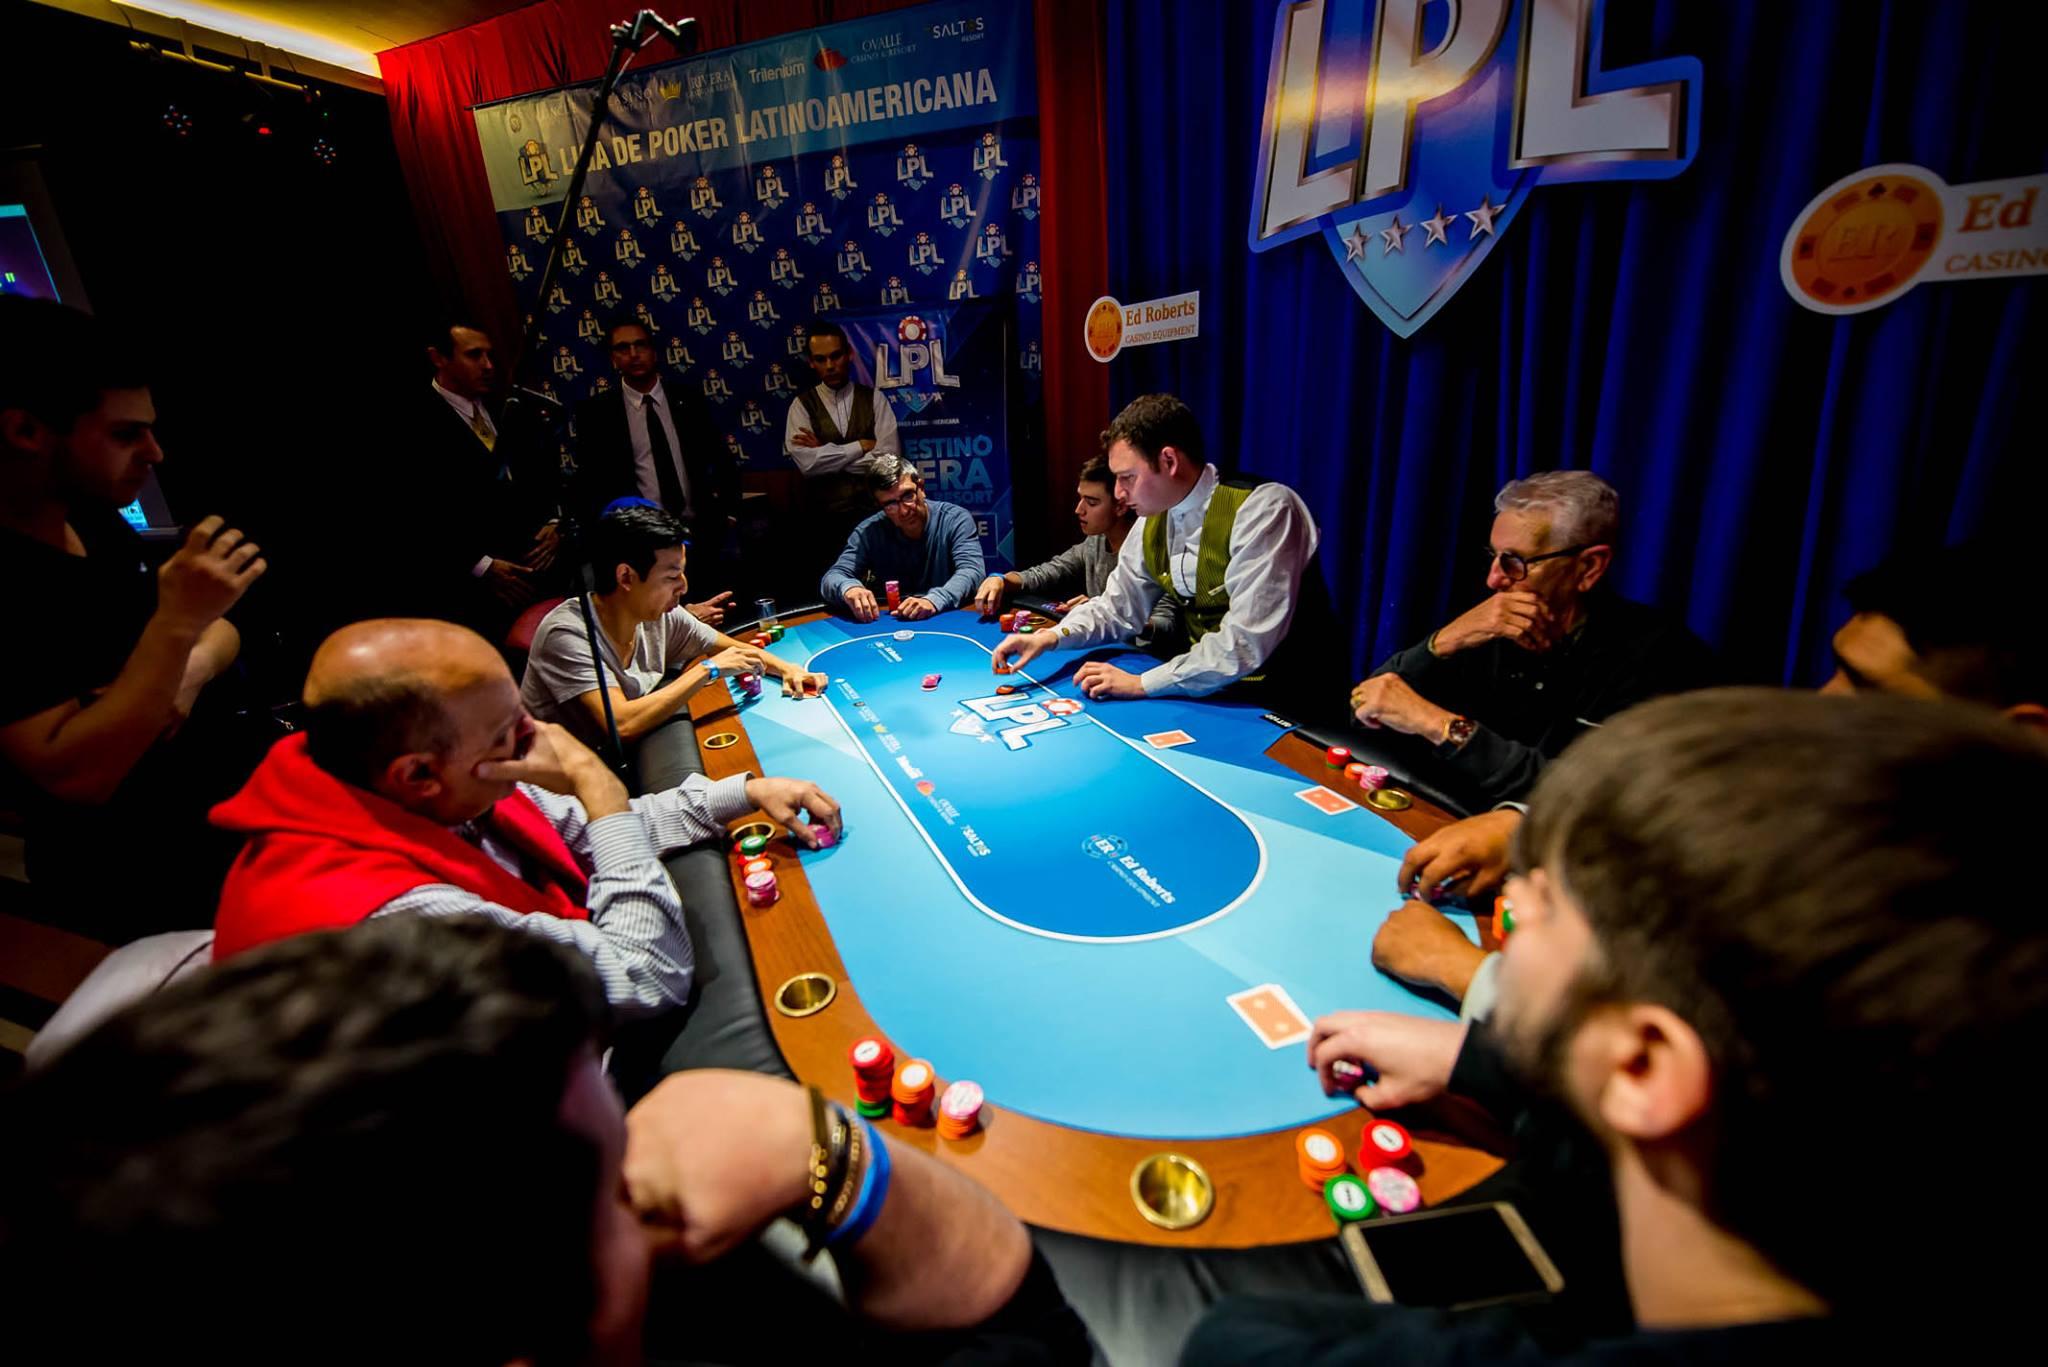 Liga de Poker Latinoamericana 2017